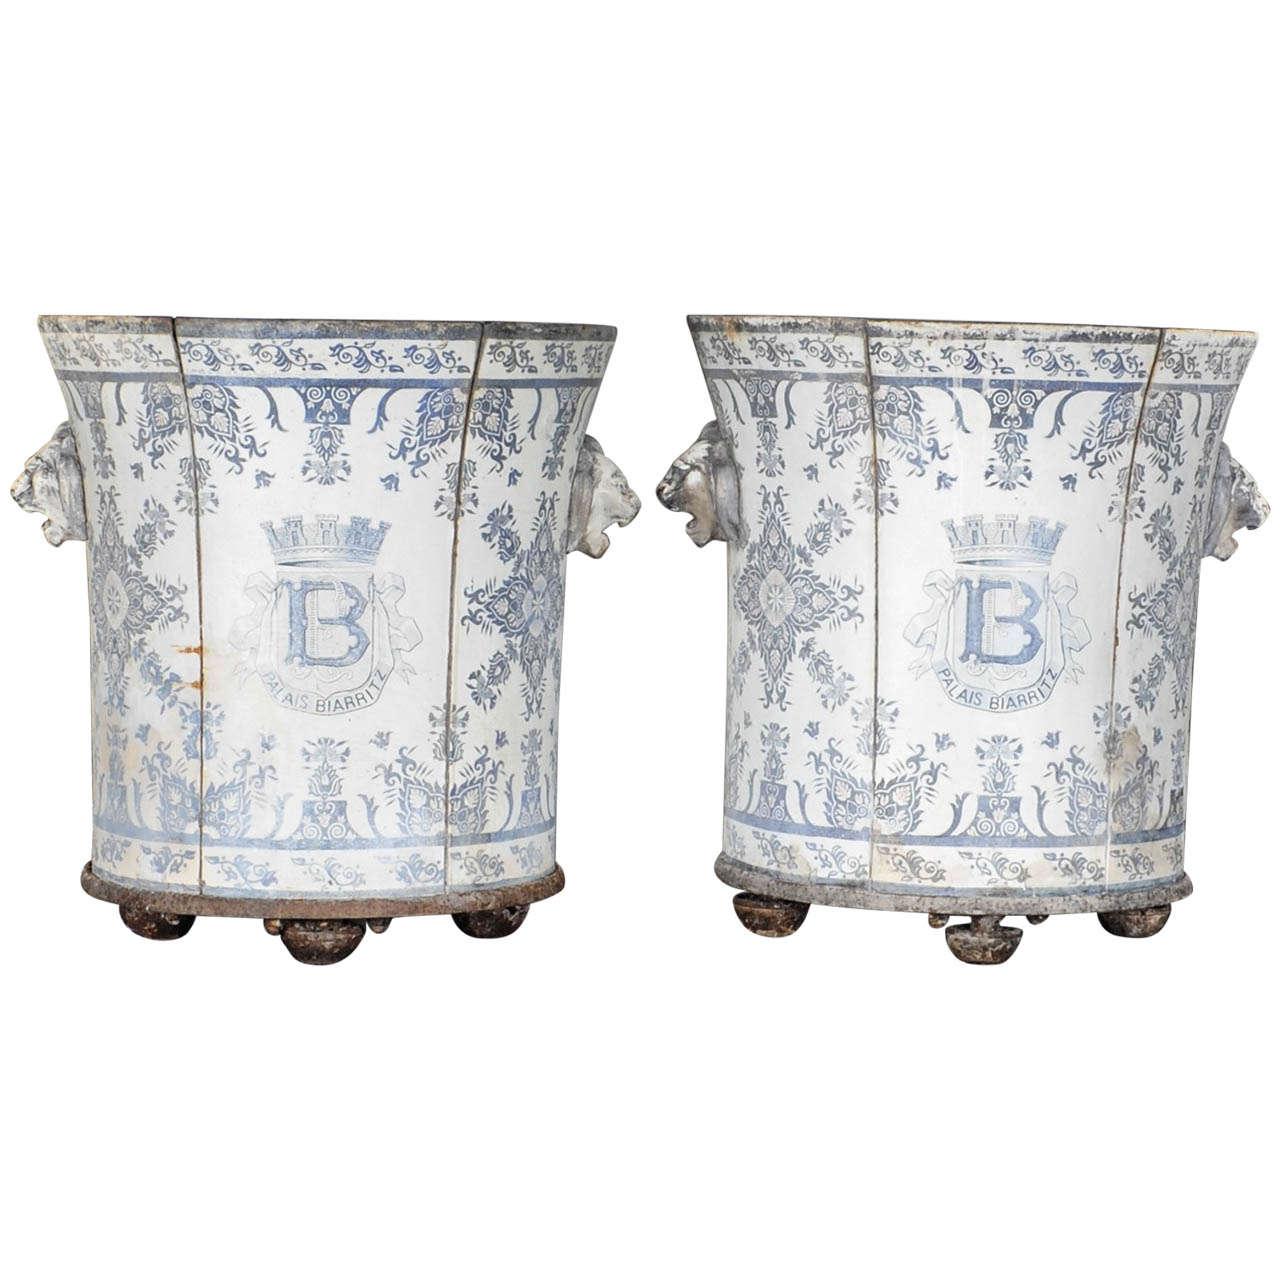 Modern Style Rouen - Pair of enameled cast iron greenhouse planters rouen style 1